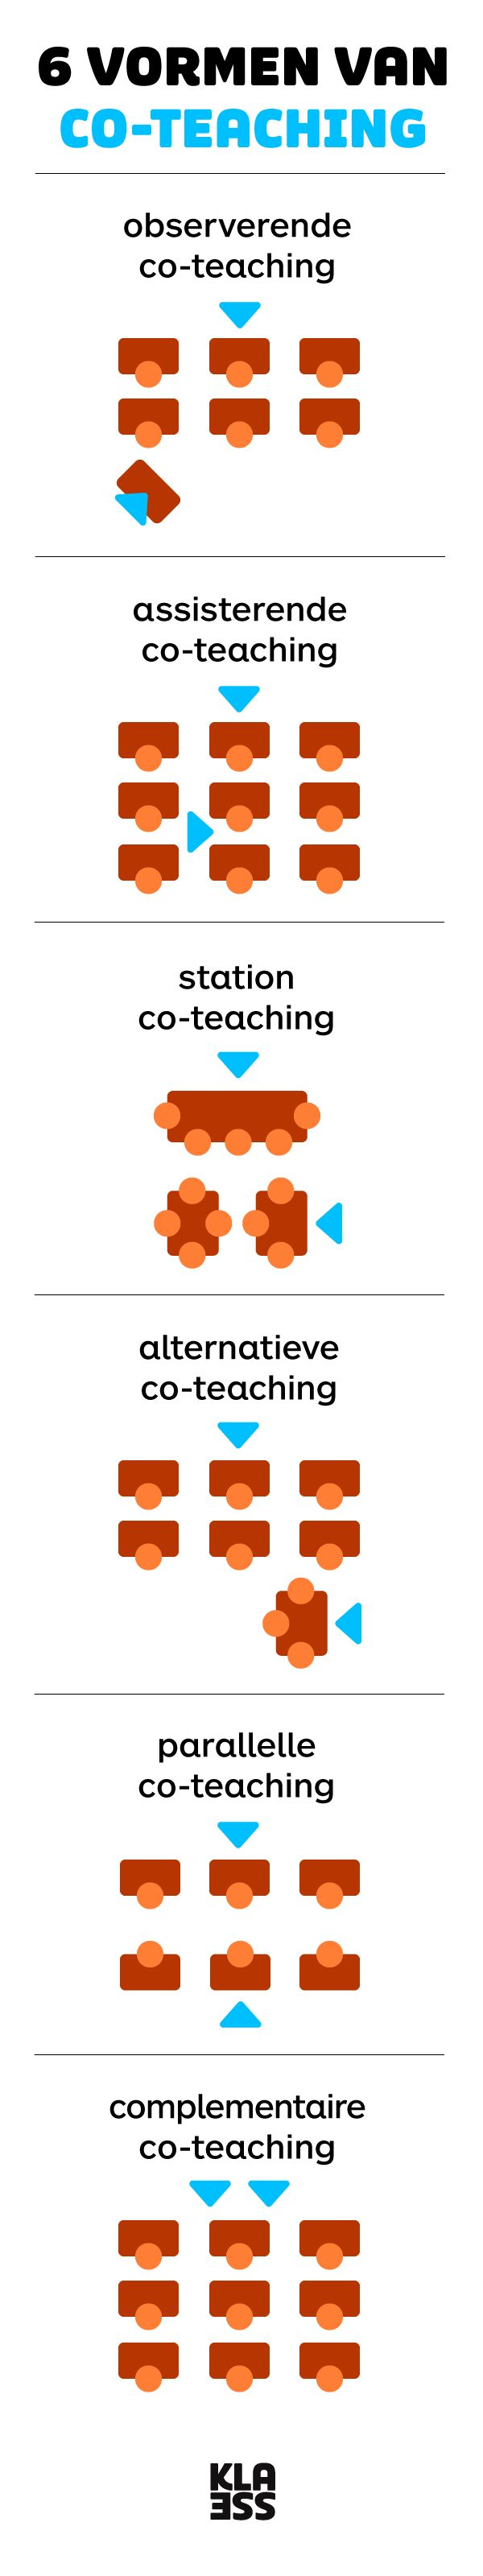 Ontdek de 6 vormen van co-teaching. #coteaching #teamteaching